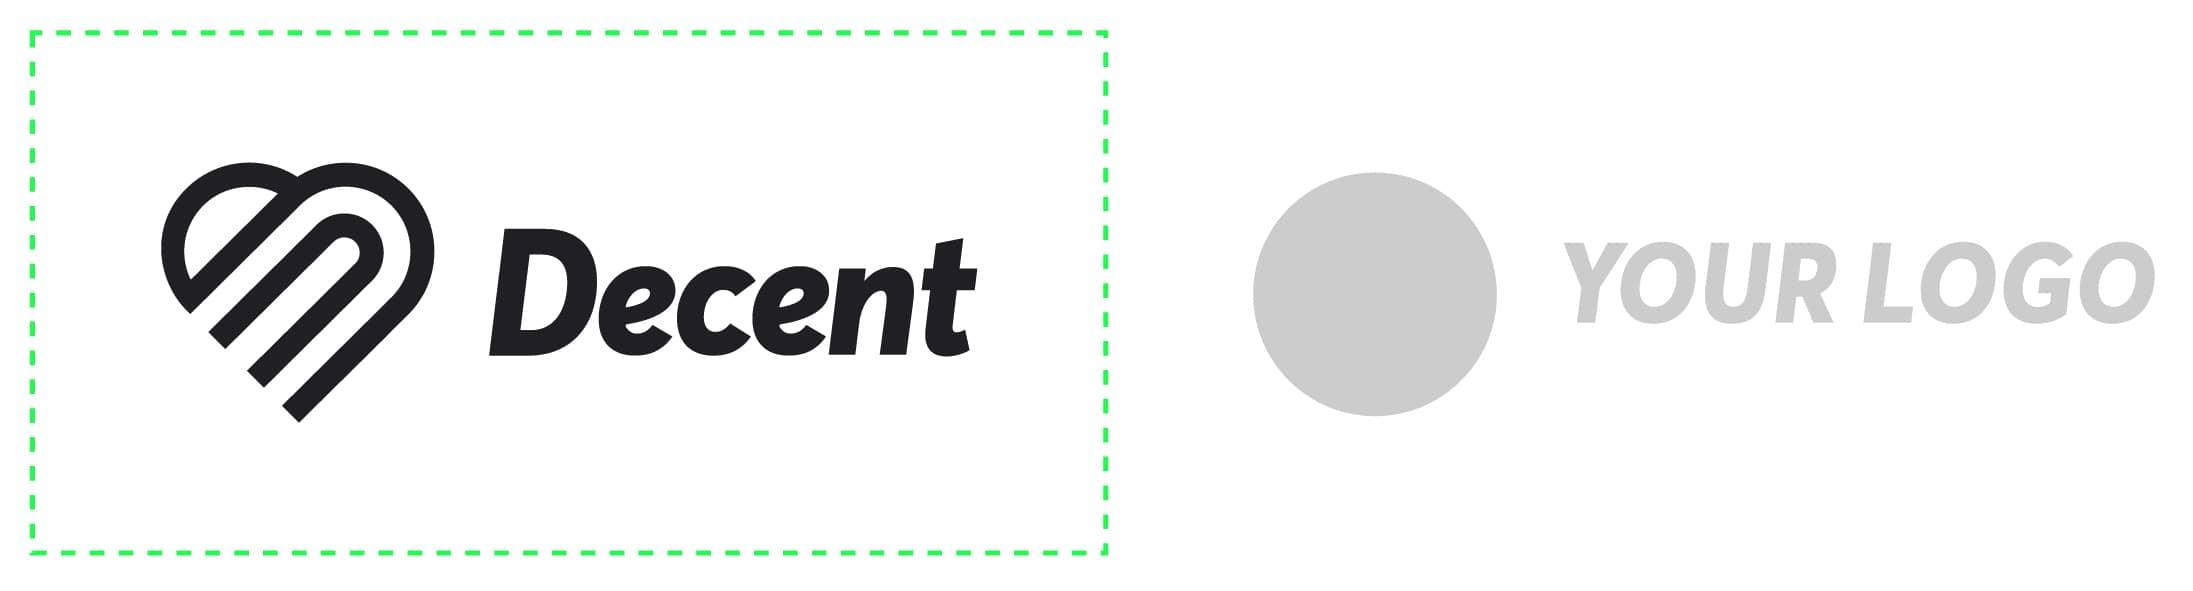 Image showing proper logo placement